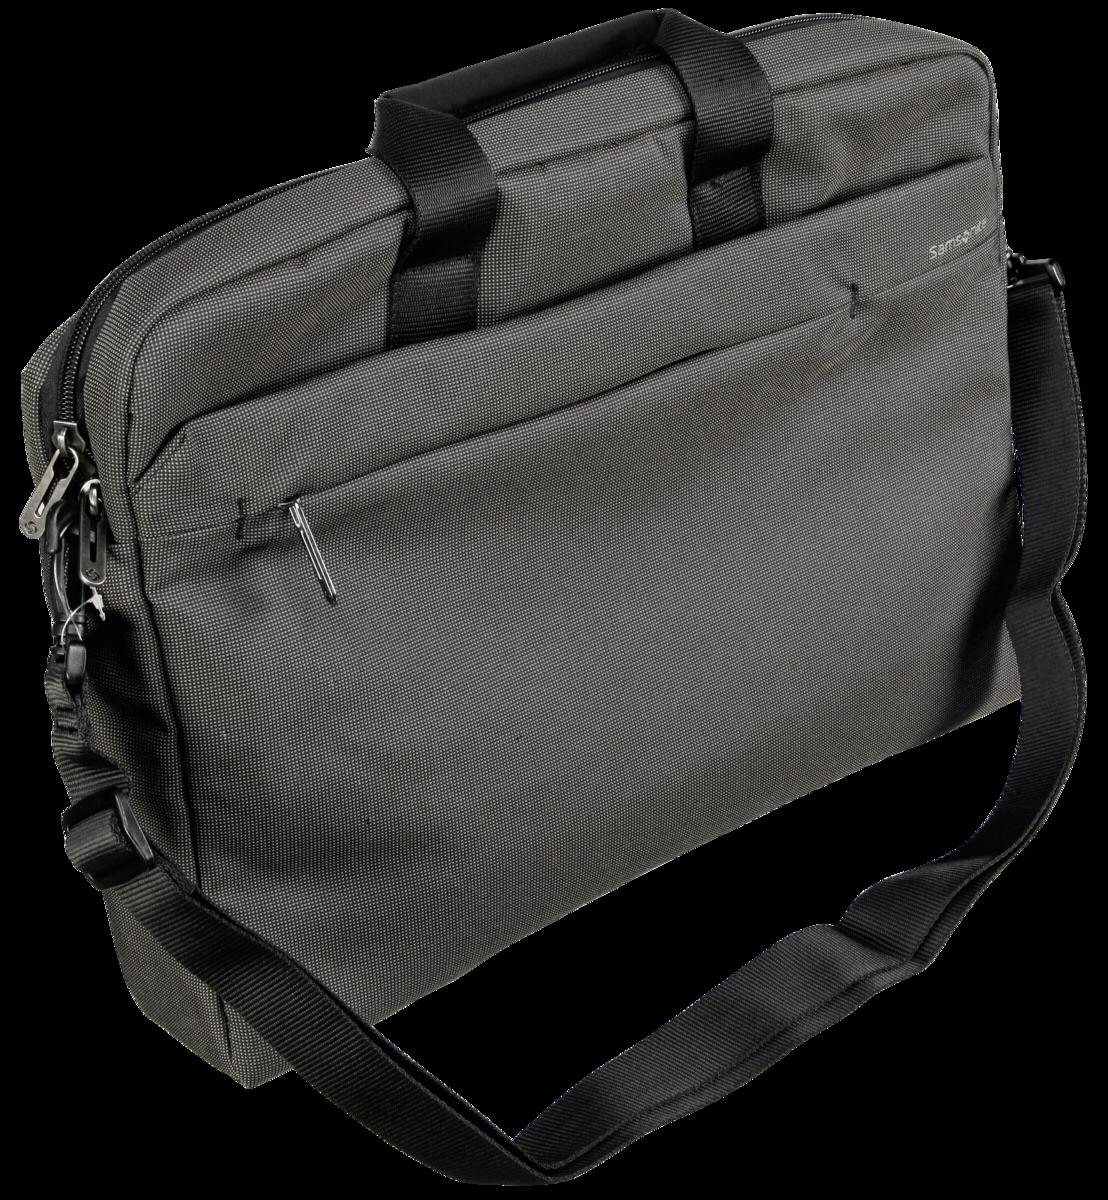 b7d708c14b Samsonite Network 2 Laptop Bag 17.3 Iron Grey